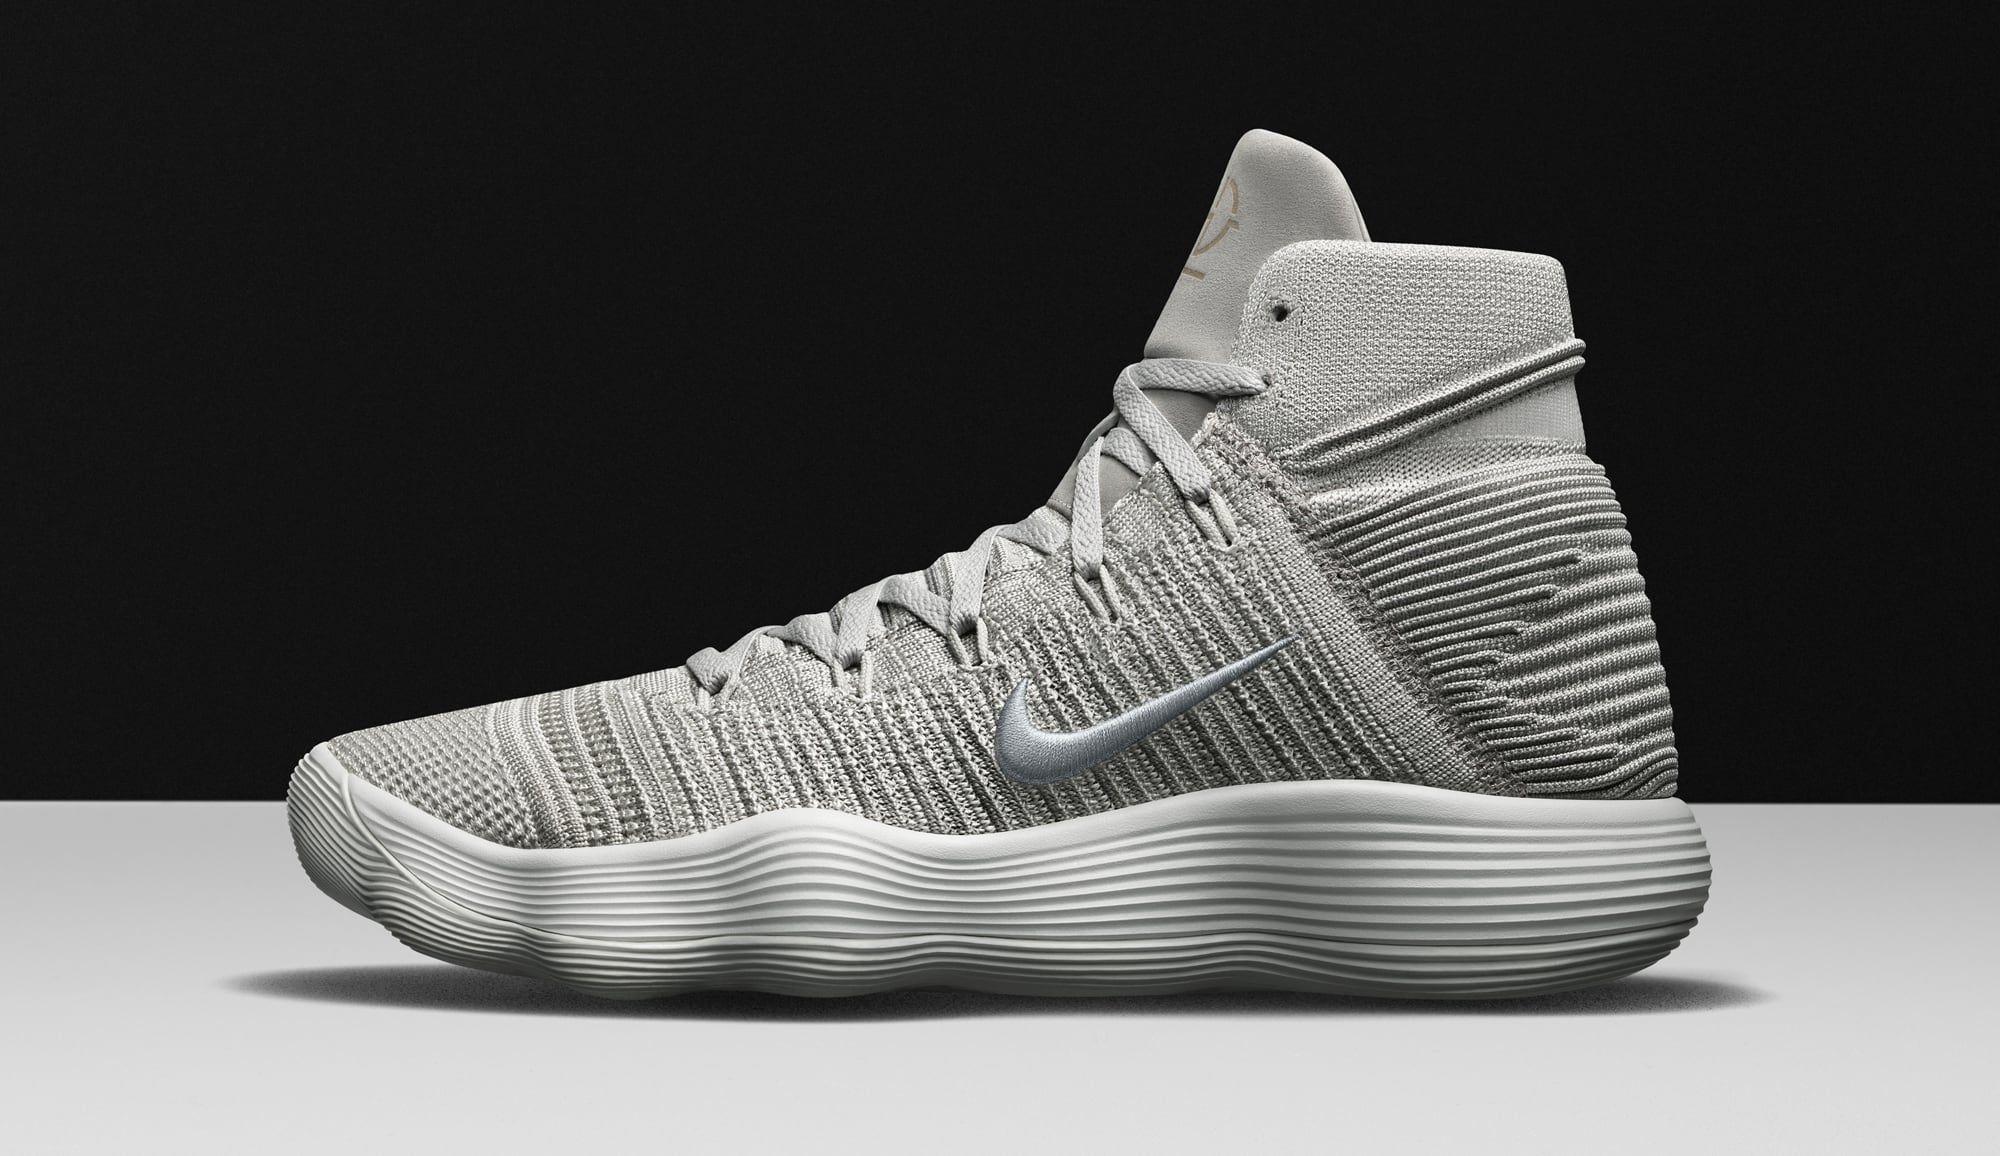 official photos e3036 57882 Nike React Hyperdunk 2017 | Athletic Footwear Mostly Nike | Nike ...